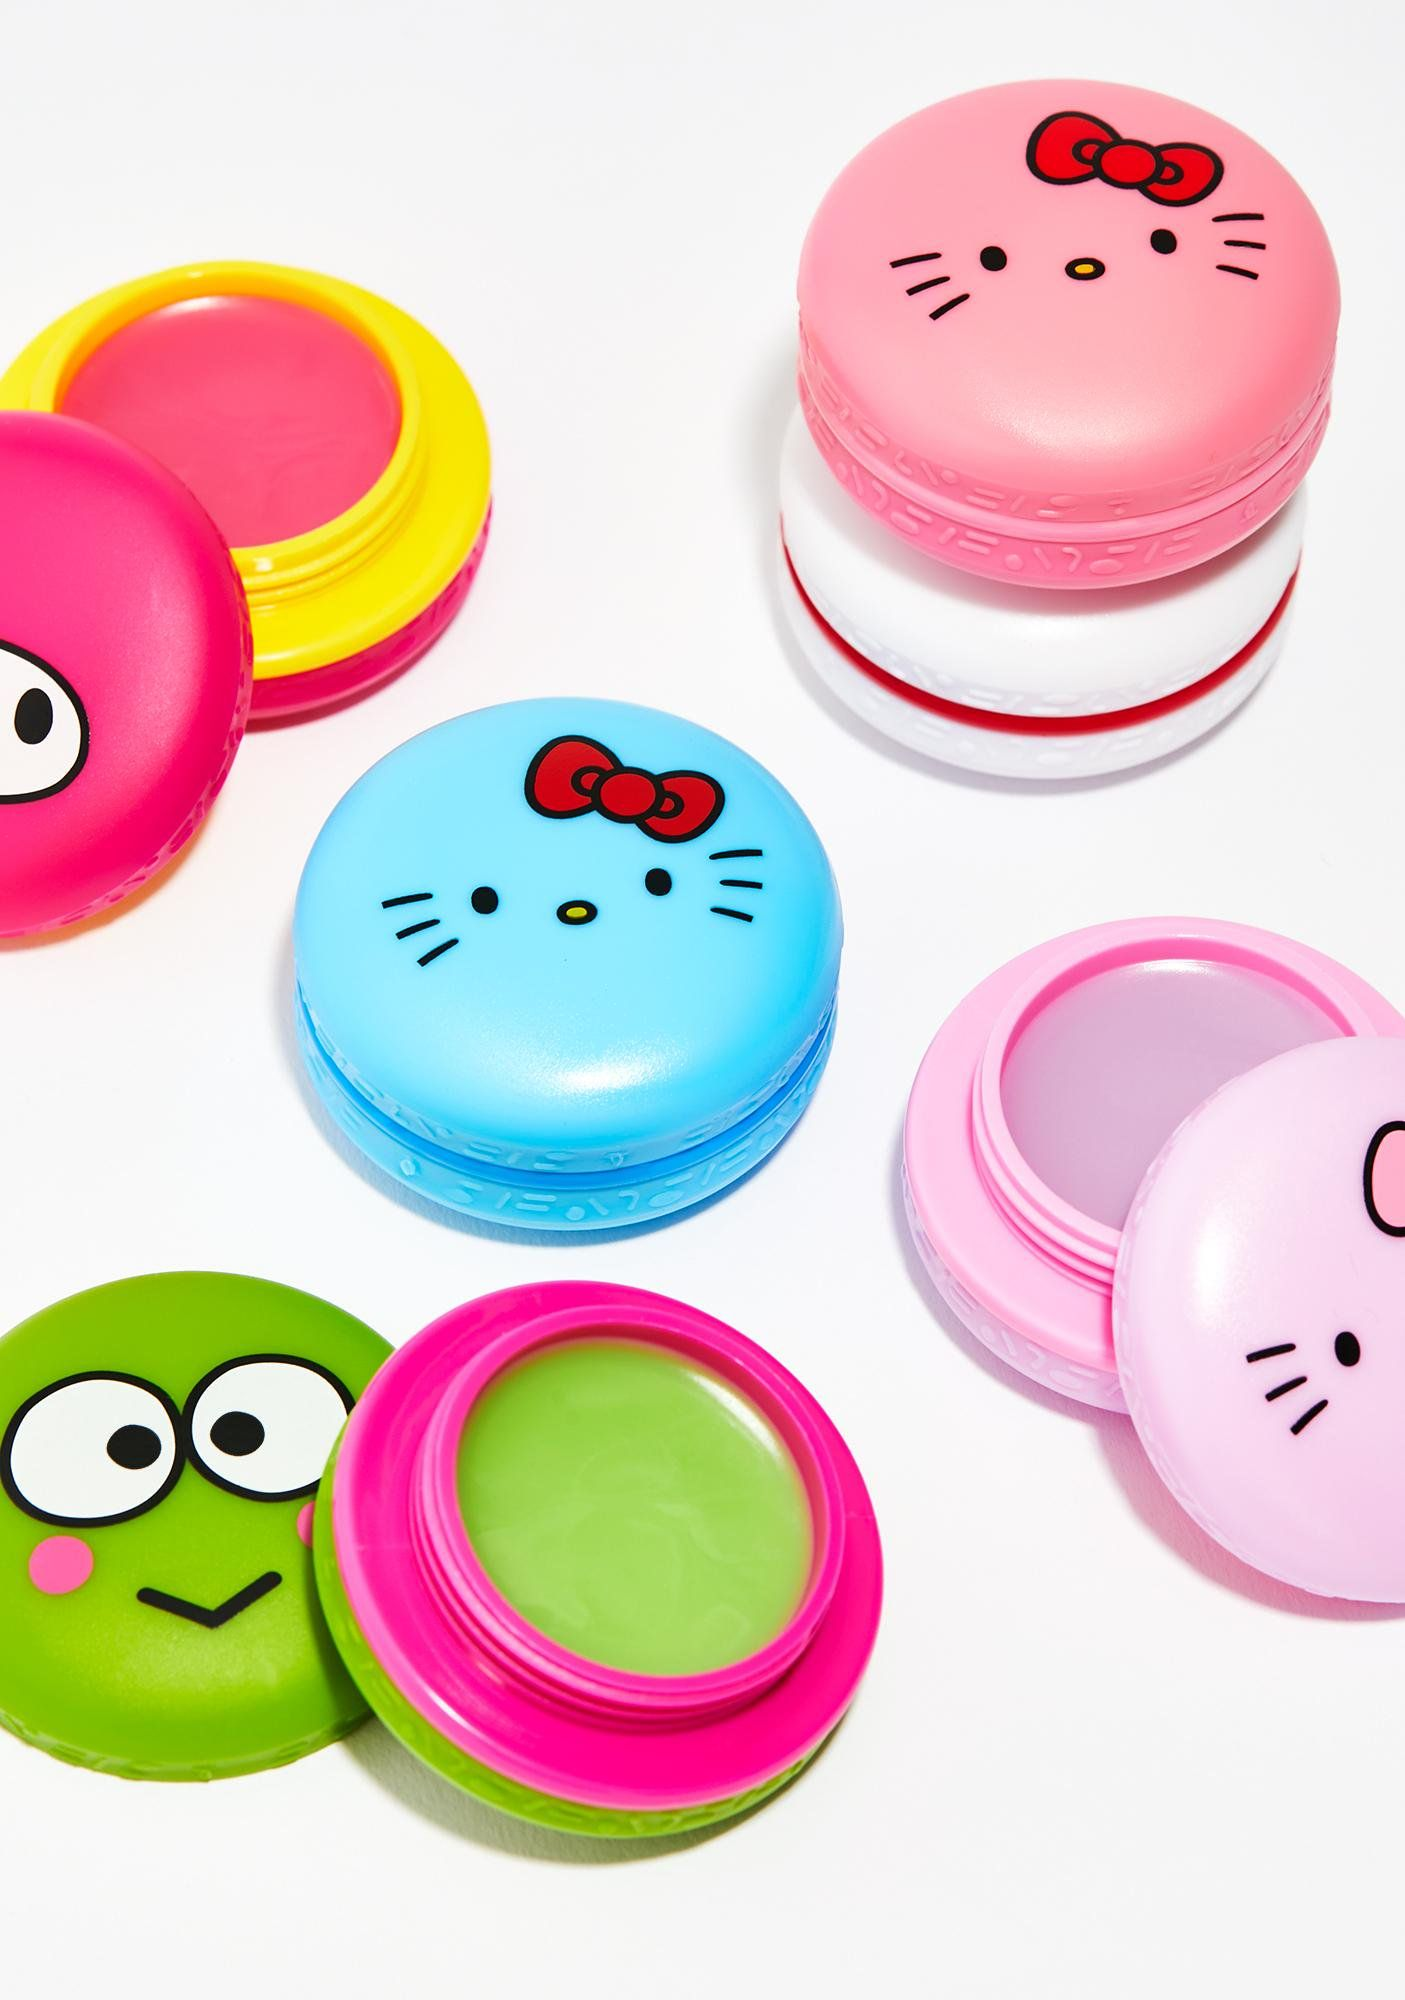 34be140da Hello Kitty Berry Macaron Lip Balm in 2019 | -stuff i want ...